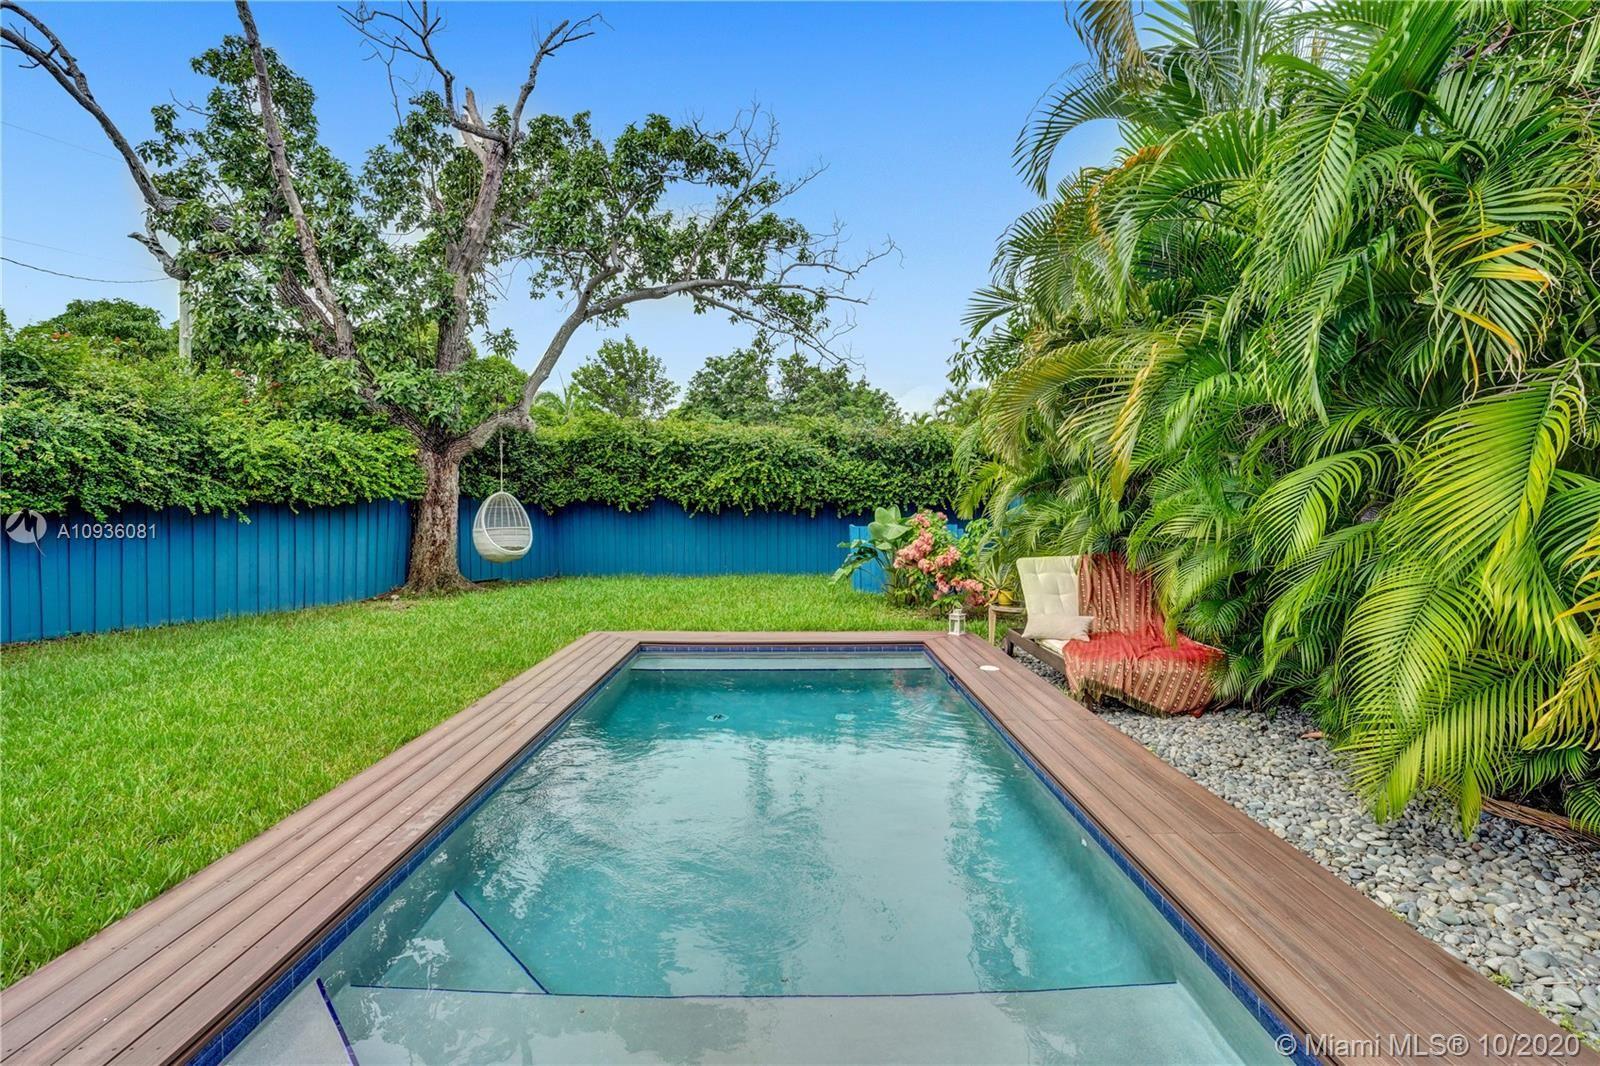 1321 S Biscayne Point Rd, Miami Beach, FL 33141 - #: A10936081